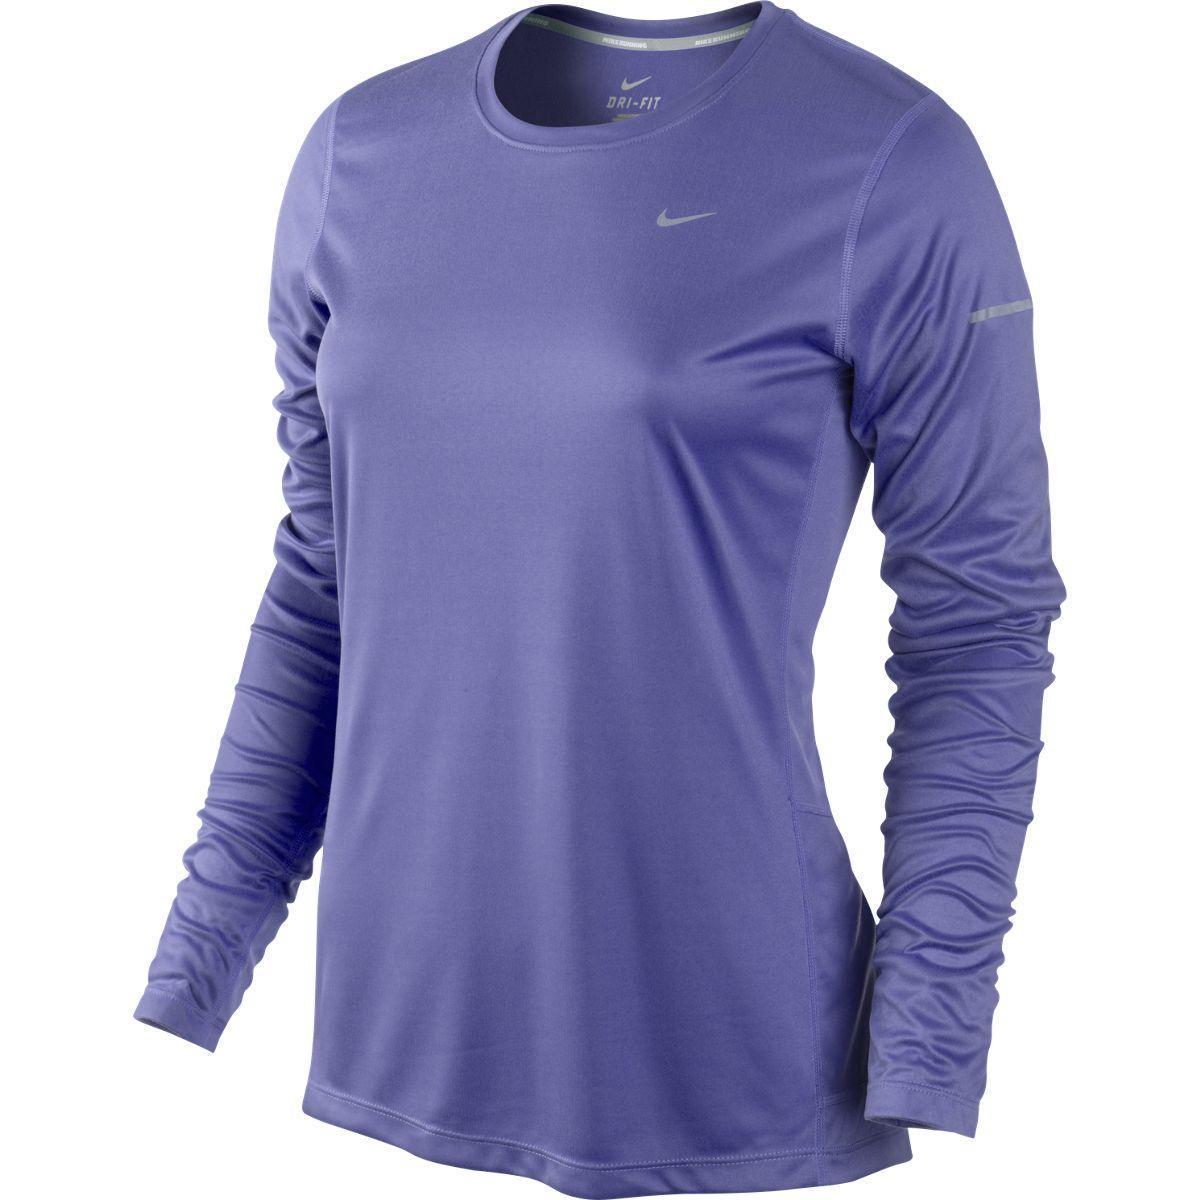 33d9ed93 Nike Womens Miler Long Sleeve Running Top - Purple Haze/Reflective Silver -  Tennisnuts.com